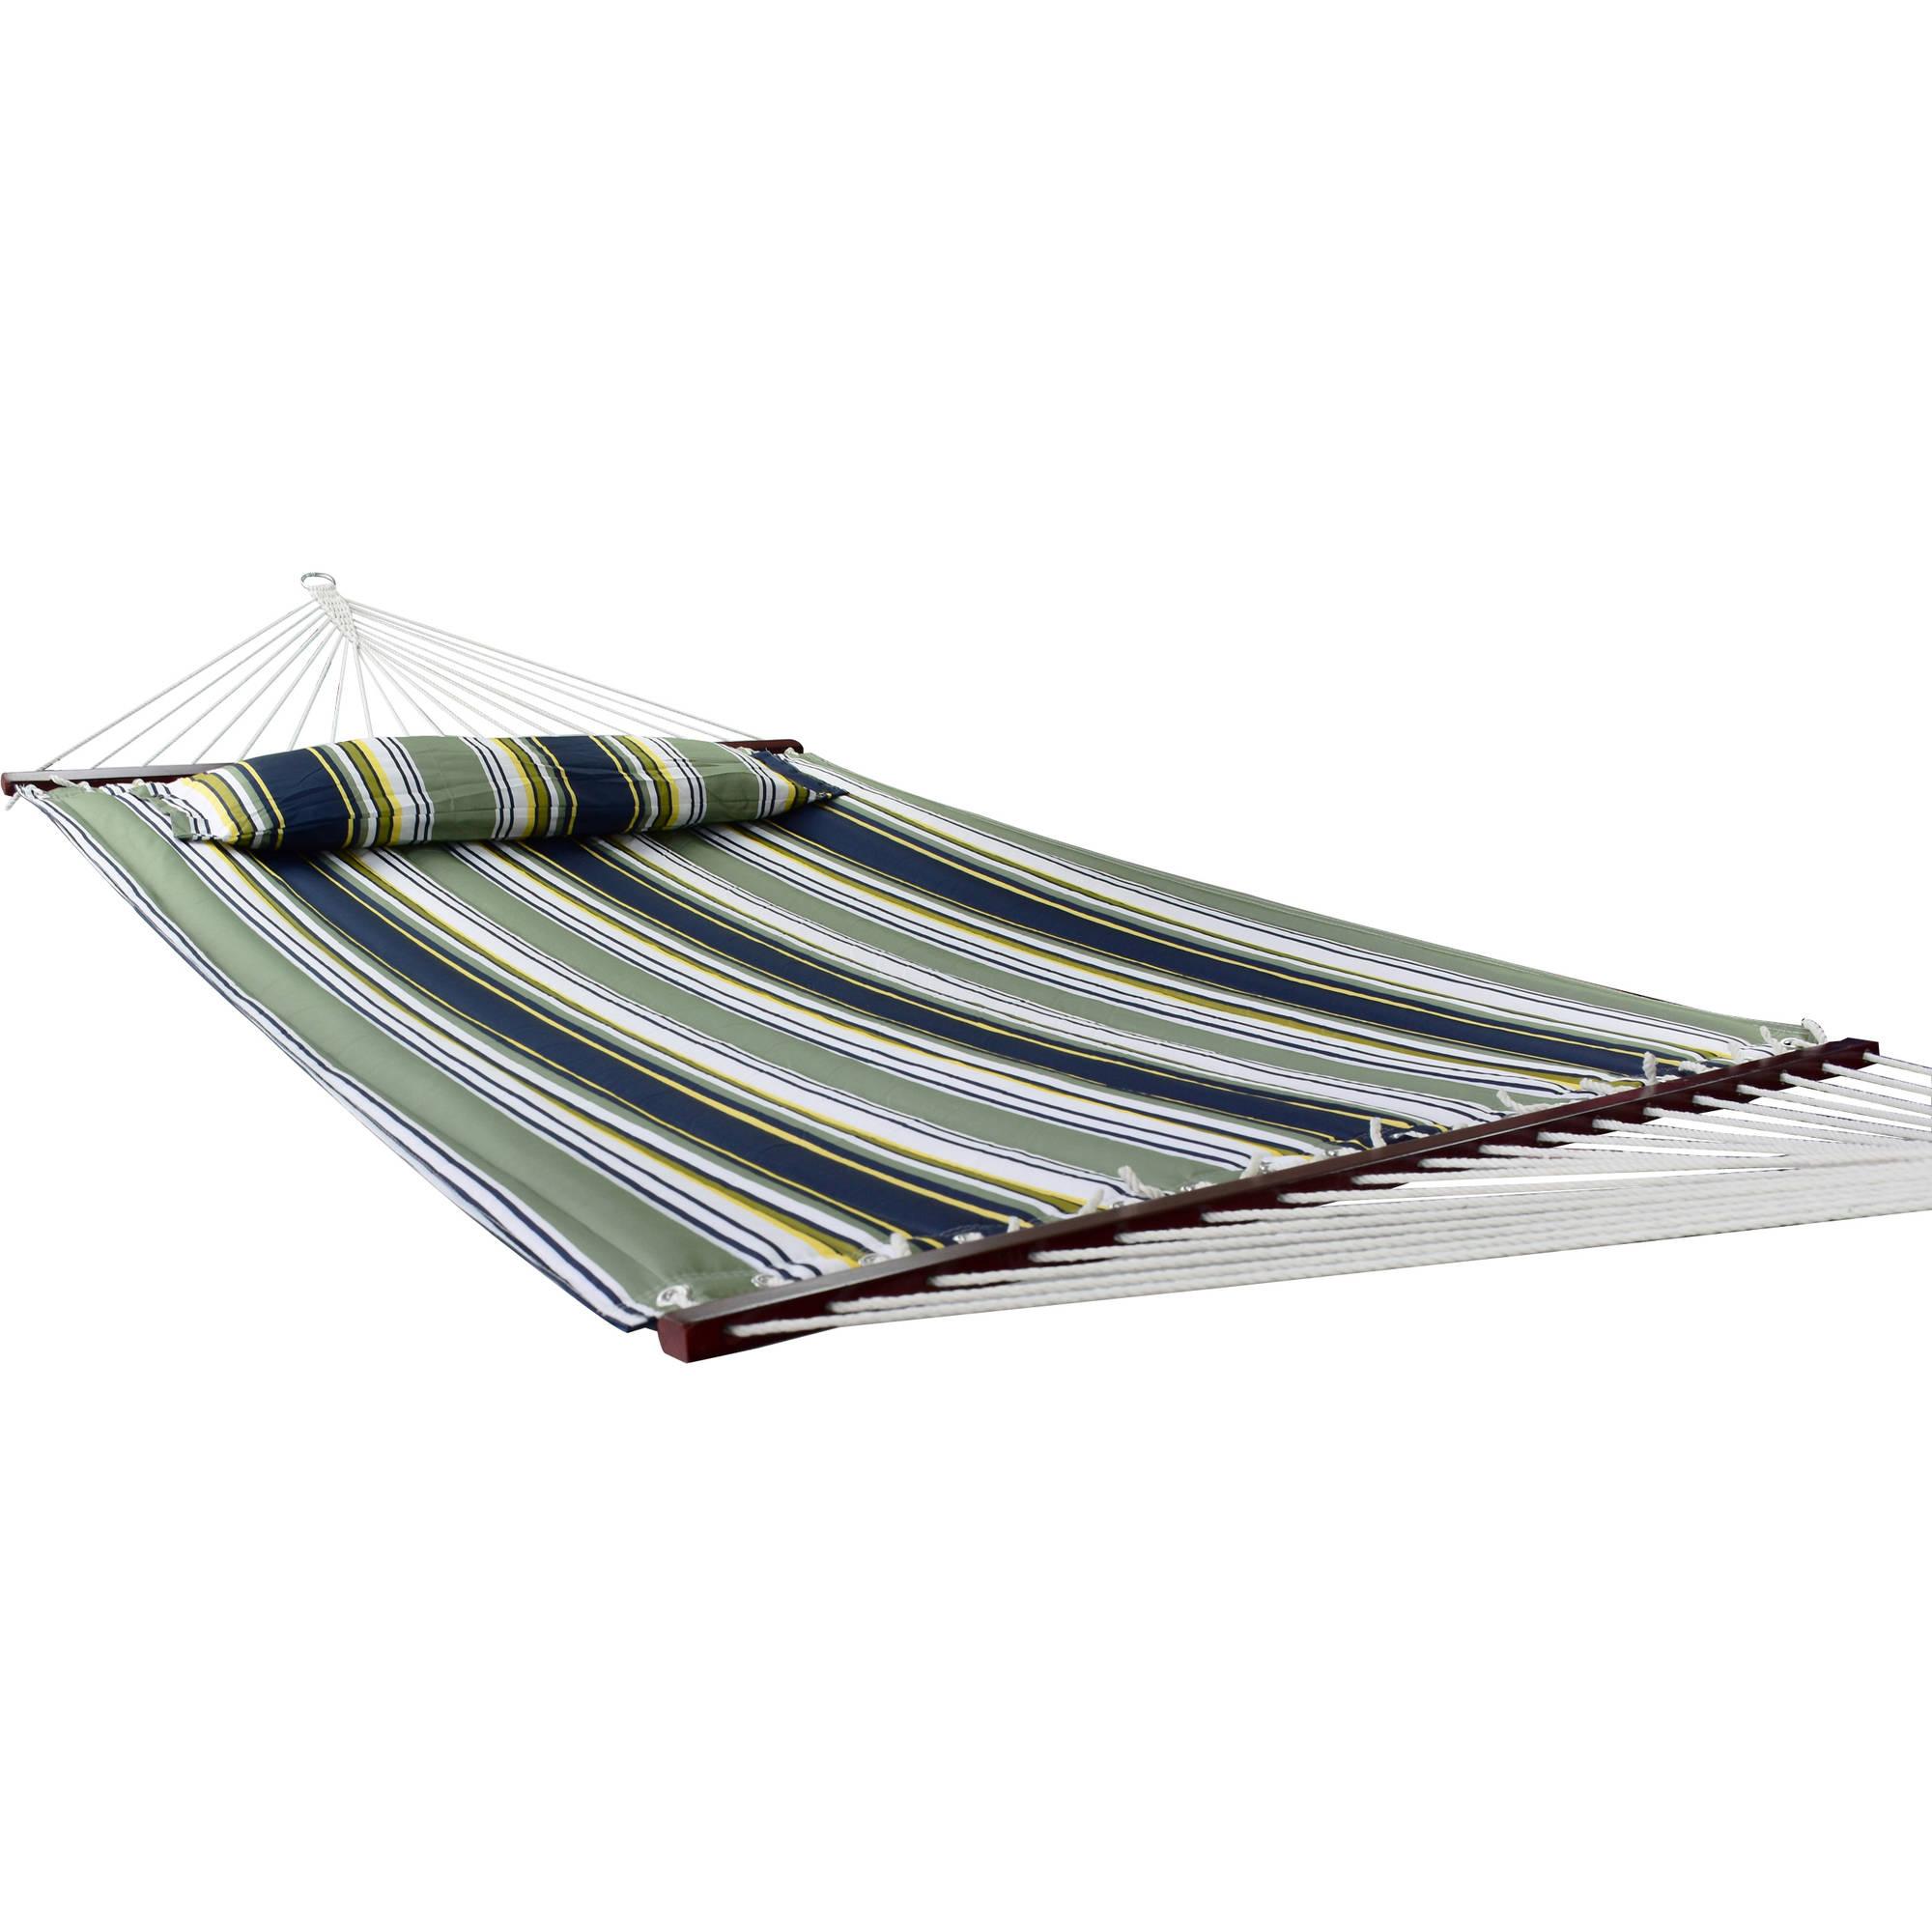 Sorbus Hammock with Spreader Bars and Detachable Pillow, Heavy Duty, 450-Pound Capacity